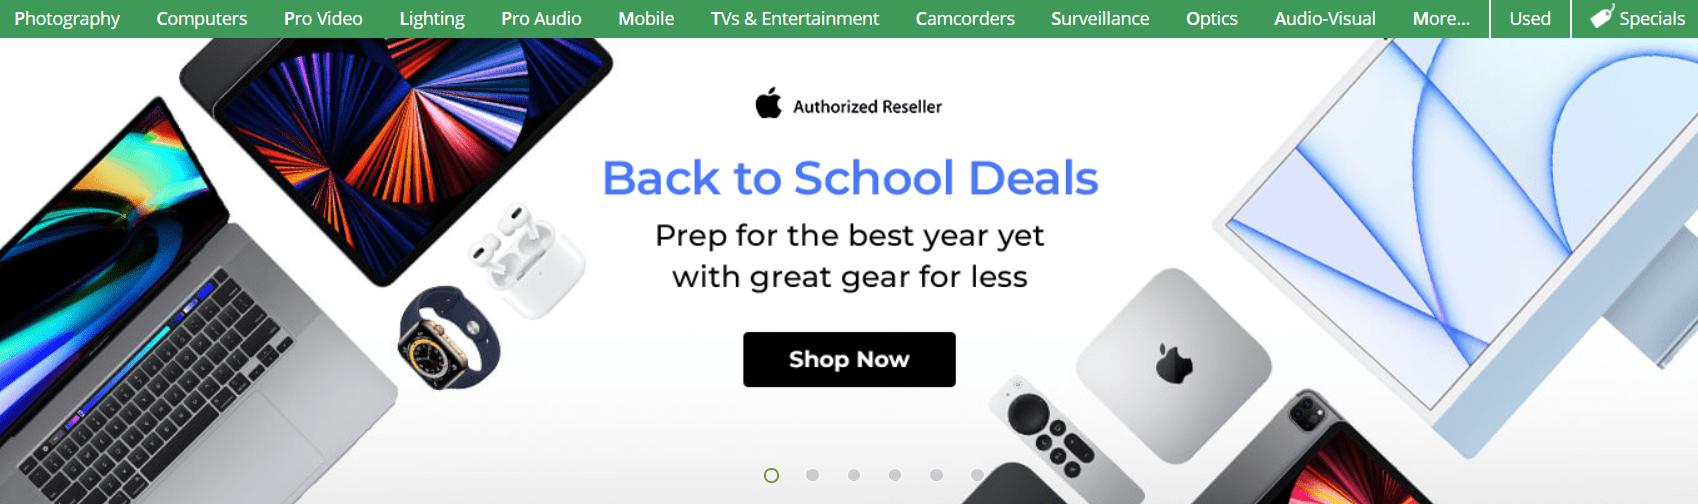 Back to school deals example